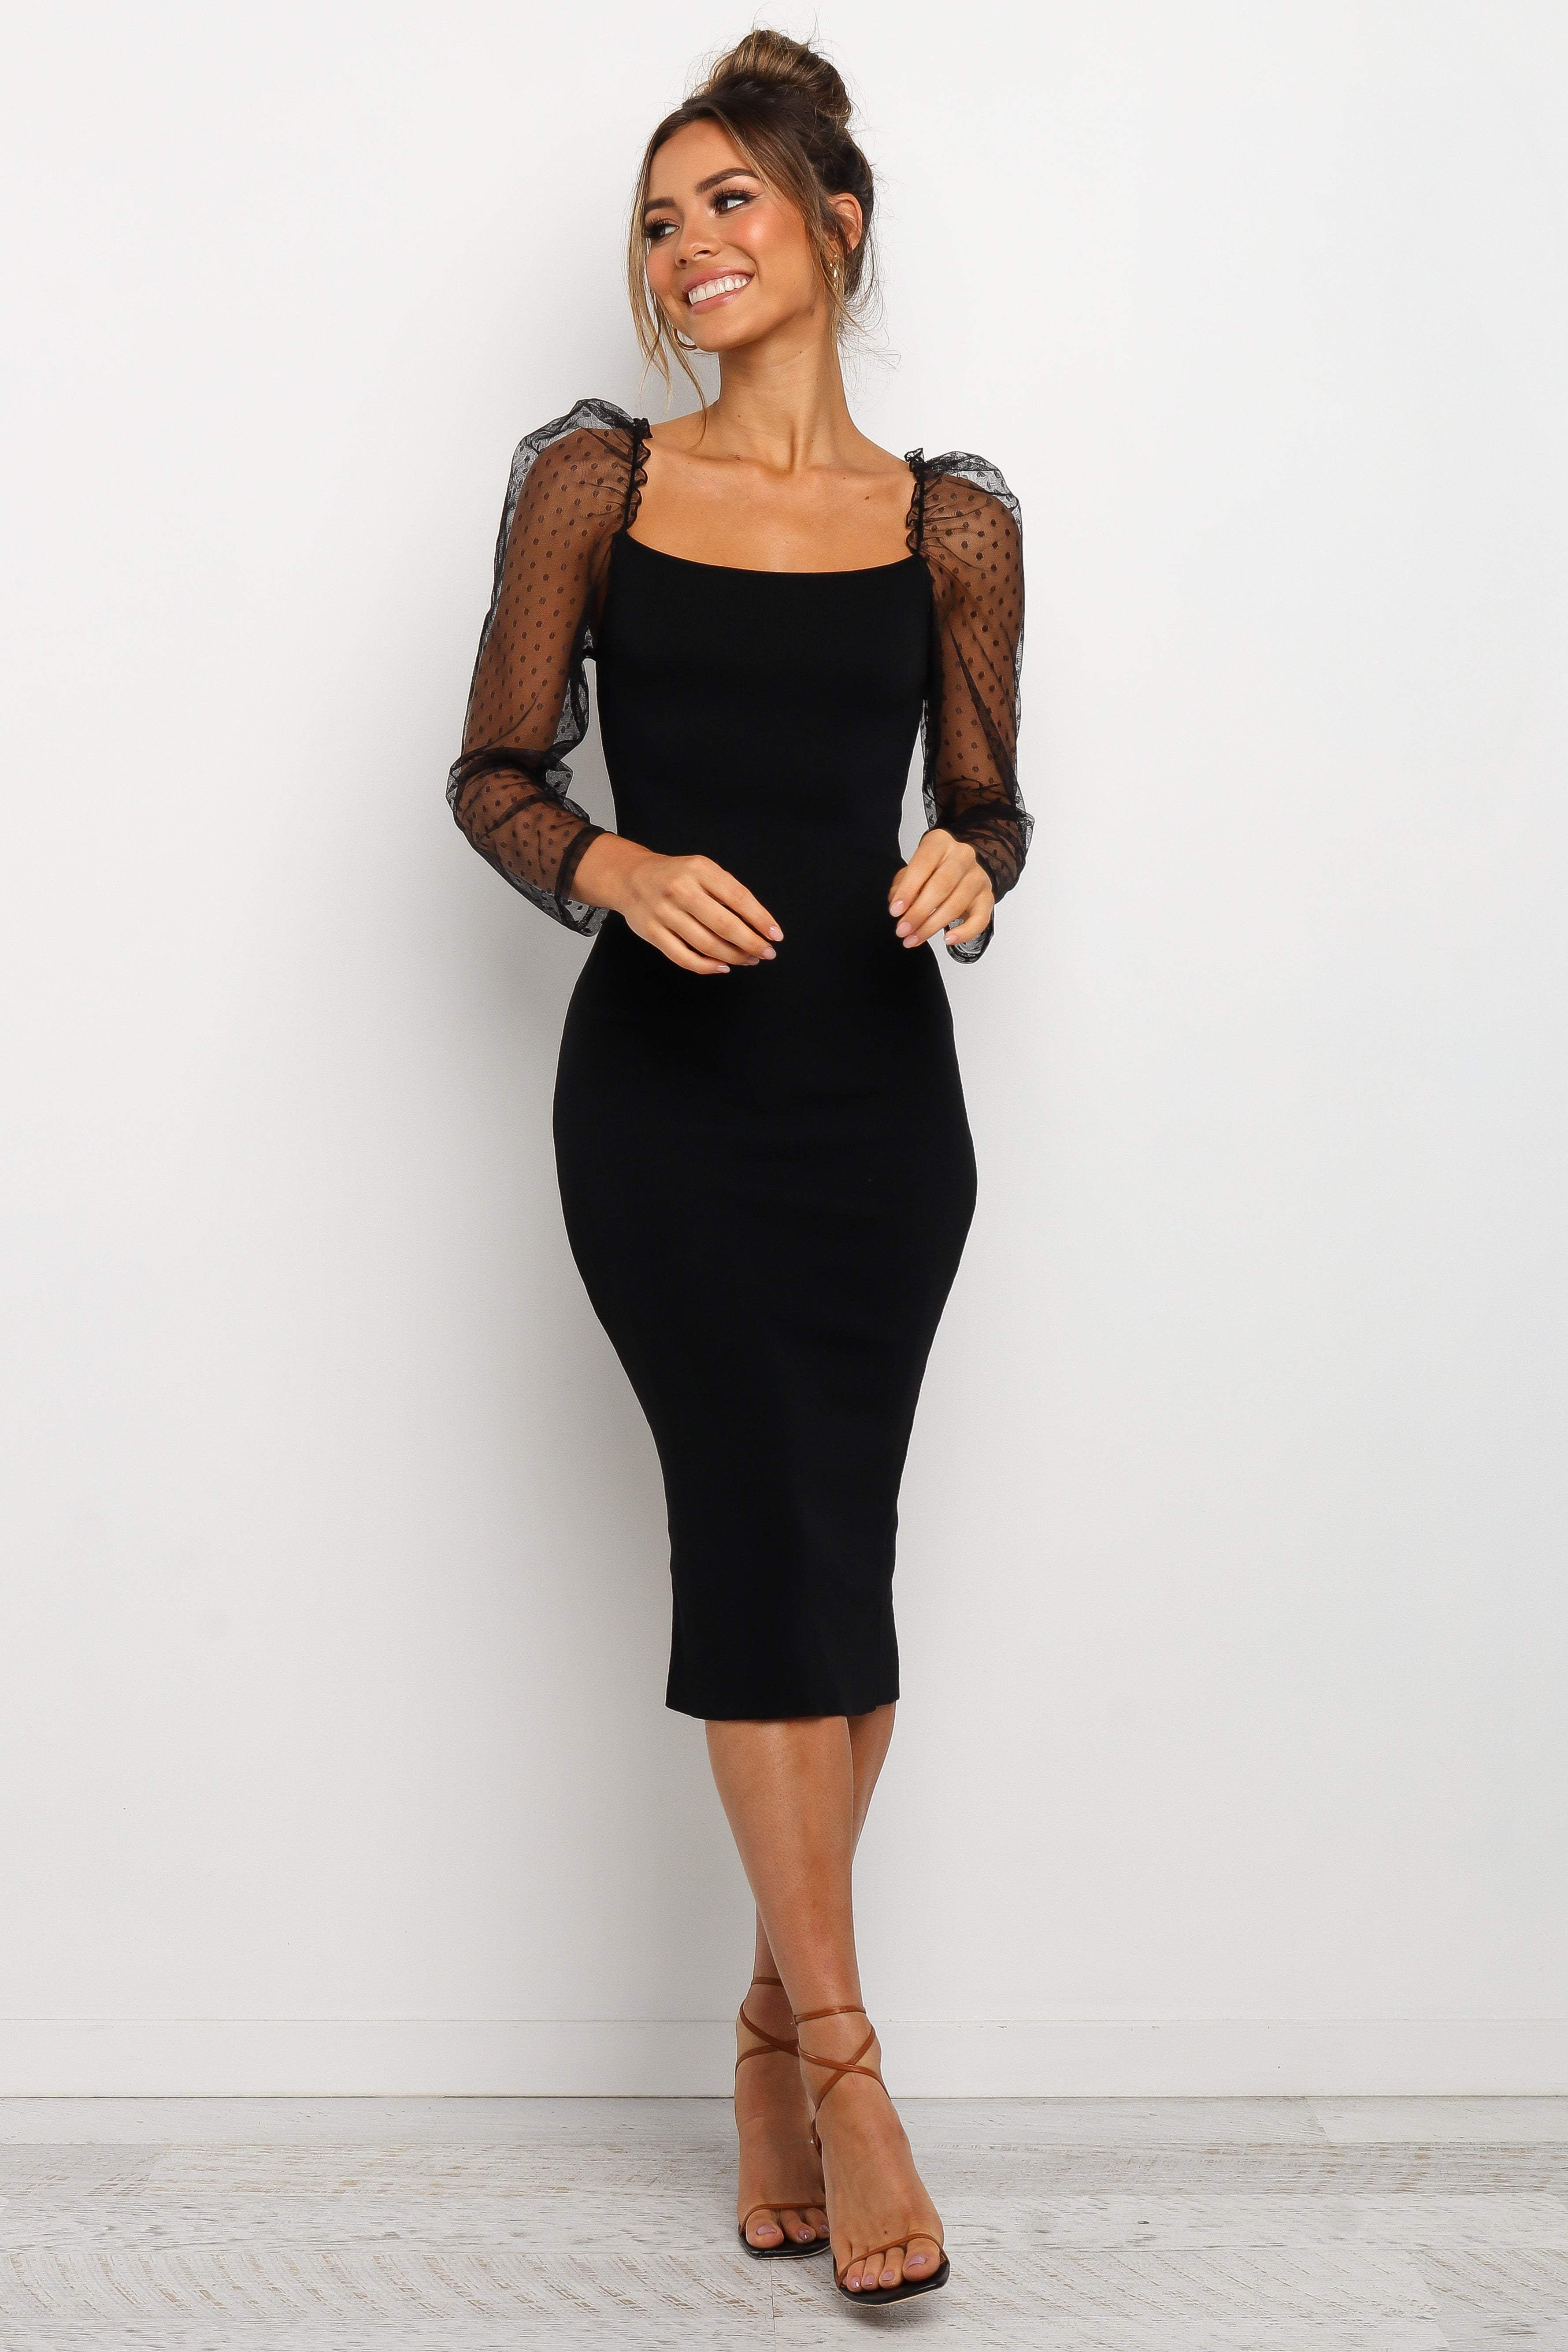 Klowie Dress Black Long Sleeve Bodycon Midi Dress Black Sheer Sleeve Dress Black Dress [ 5338 x 3559 Pixel ]